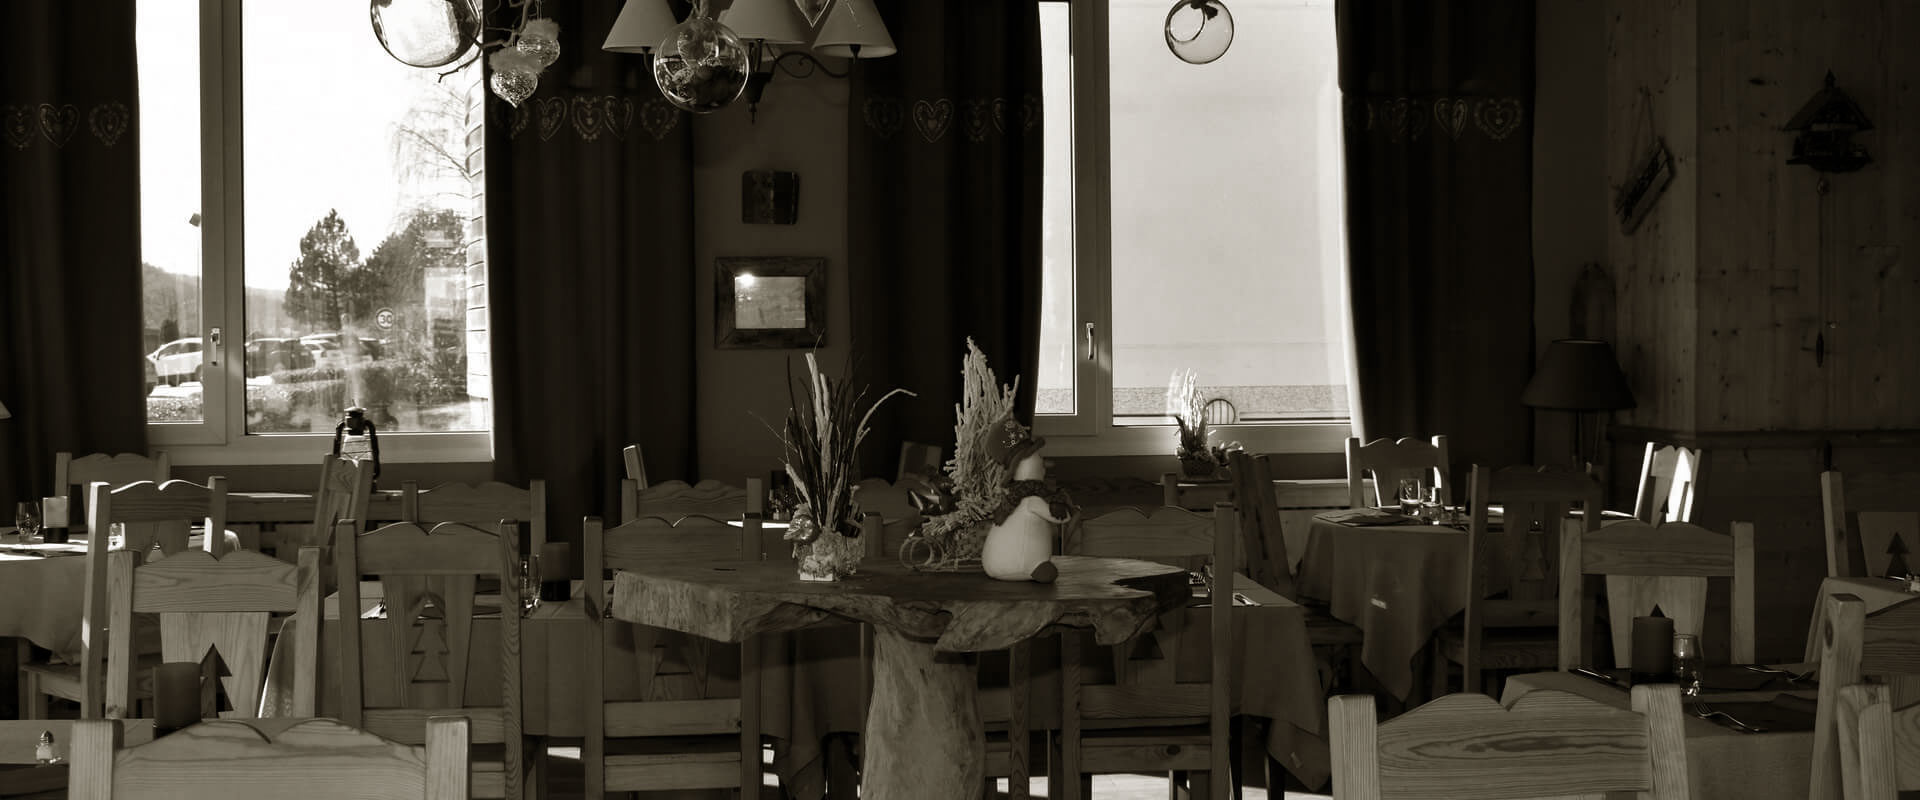 Le Bourru Gourmand Restaurant lac gerardmer